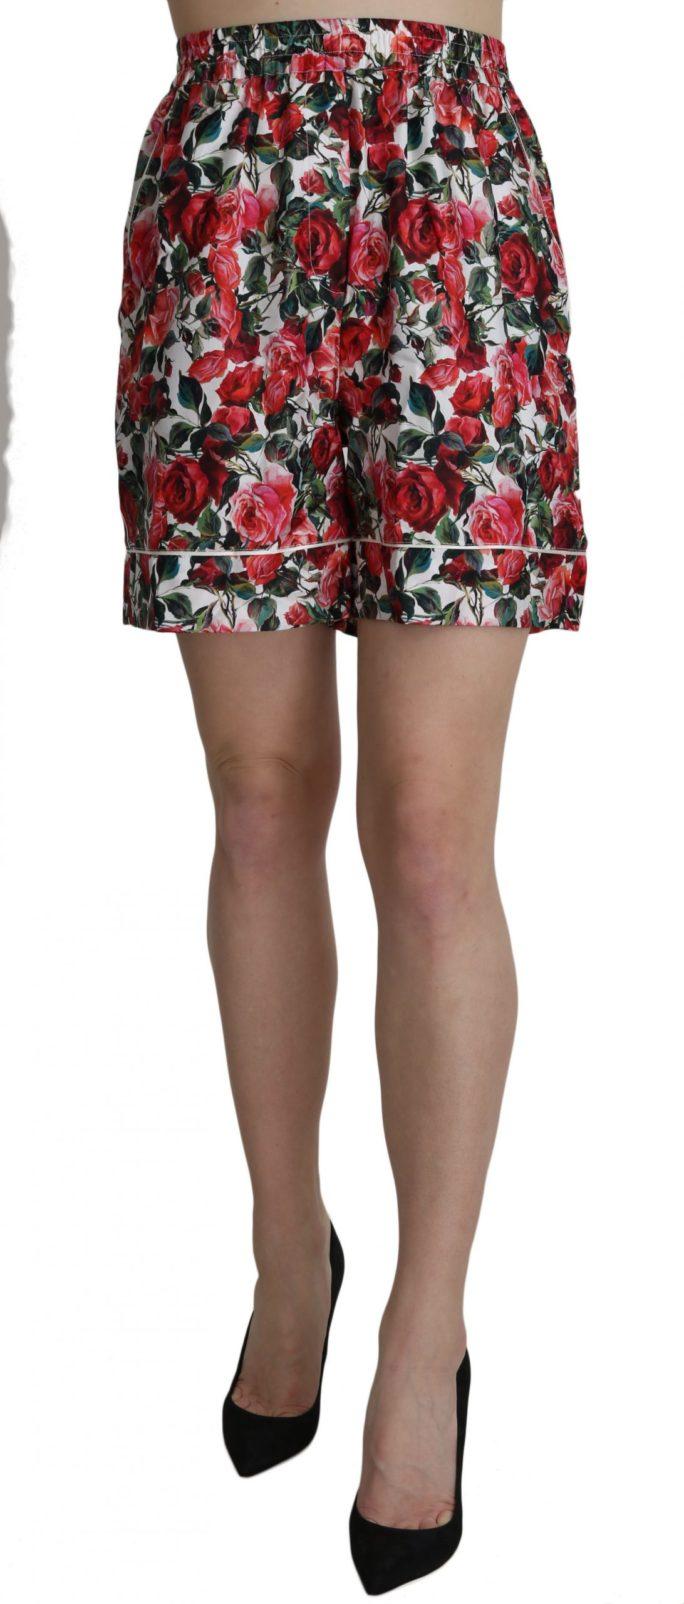 658180 Rose Print Garterized Silk Mini Shorts 3.jpg